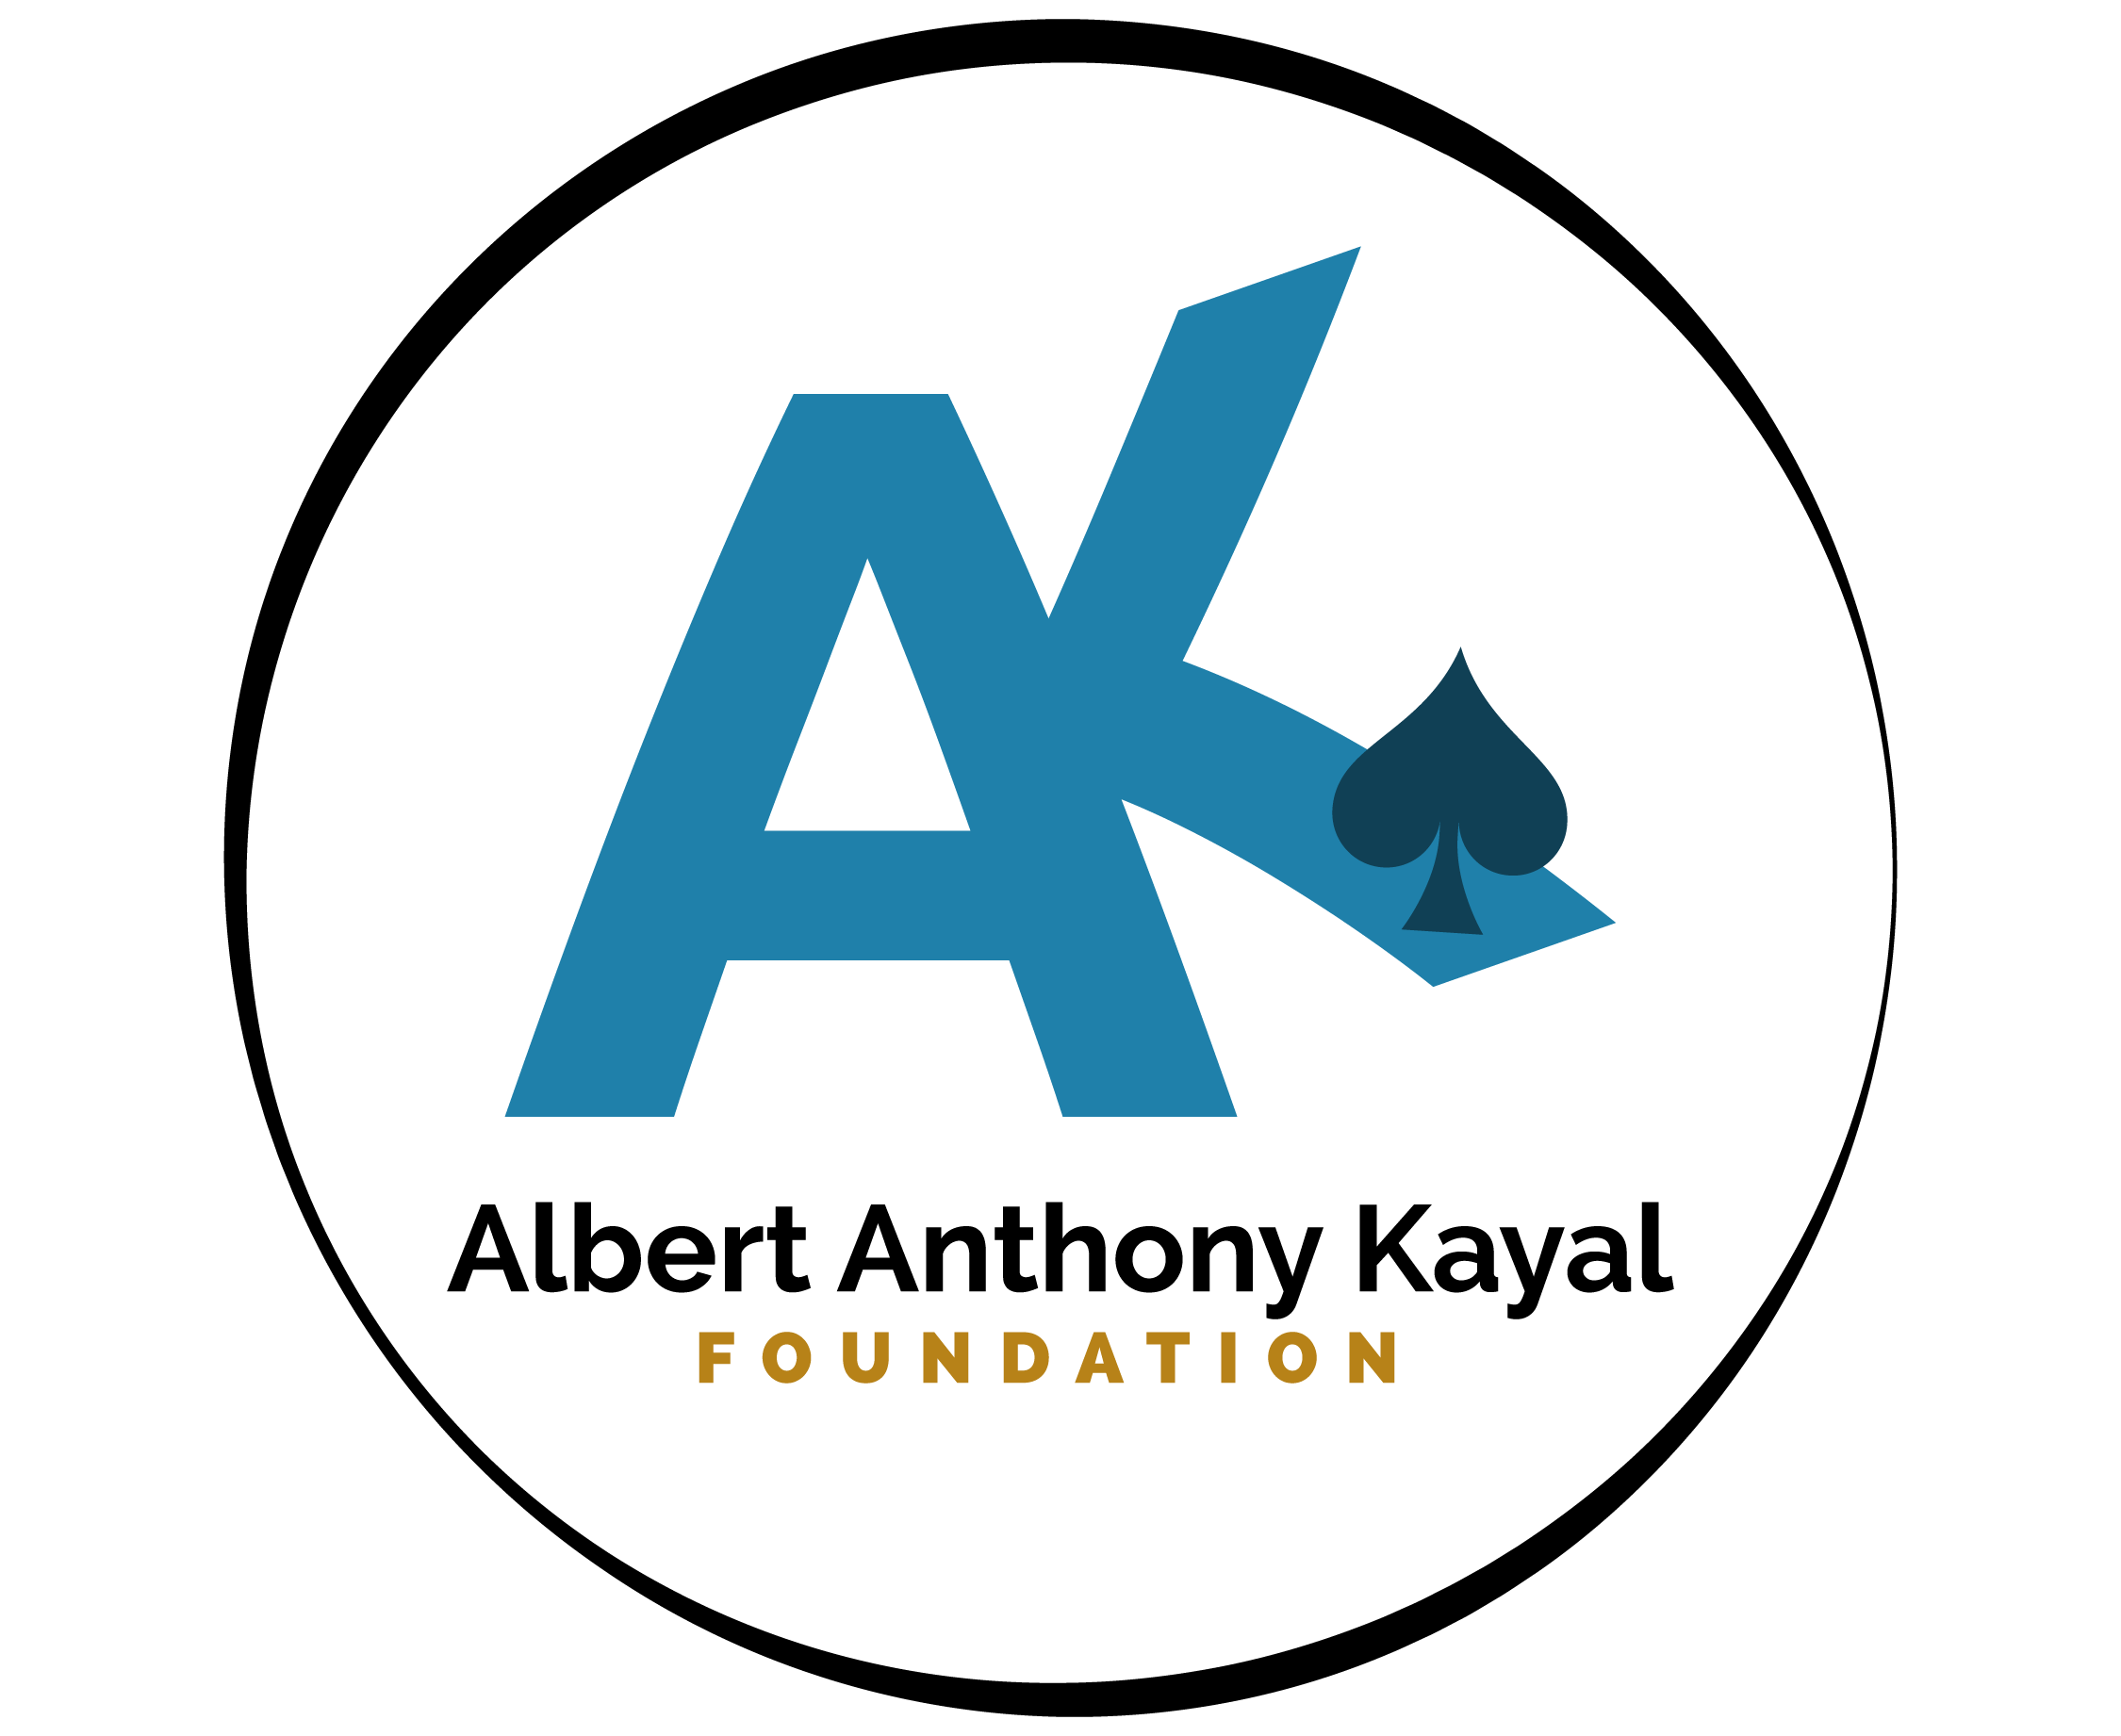 AKKFoundation_final logo-01 2.png